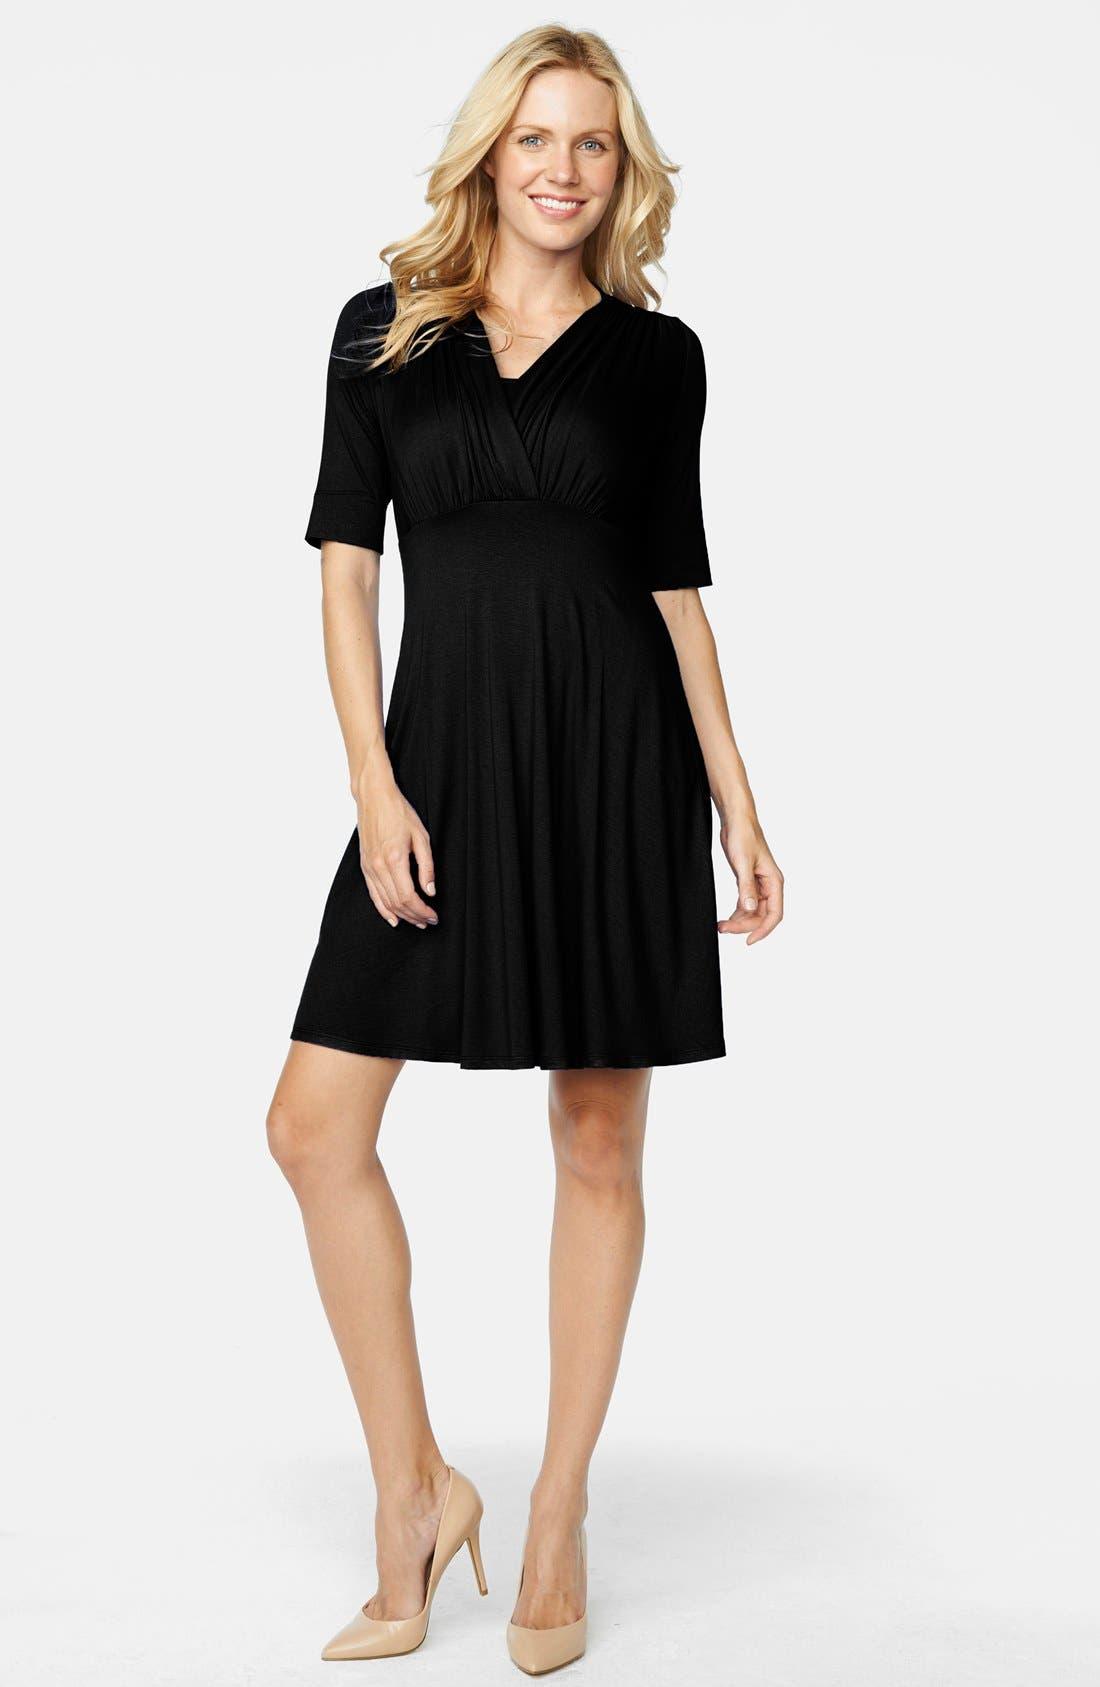 Maternal America 'Tummy Tuck' Maternity/Nursing Three Quarter Sleeve Dress